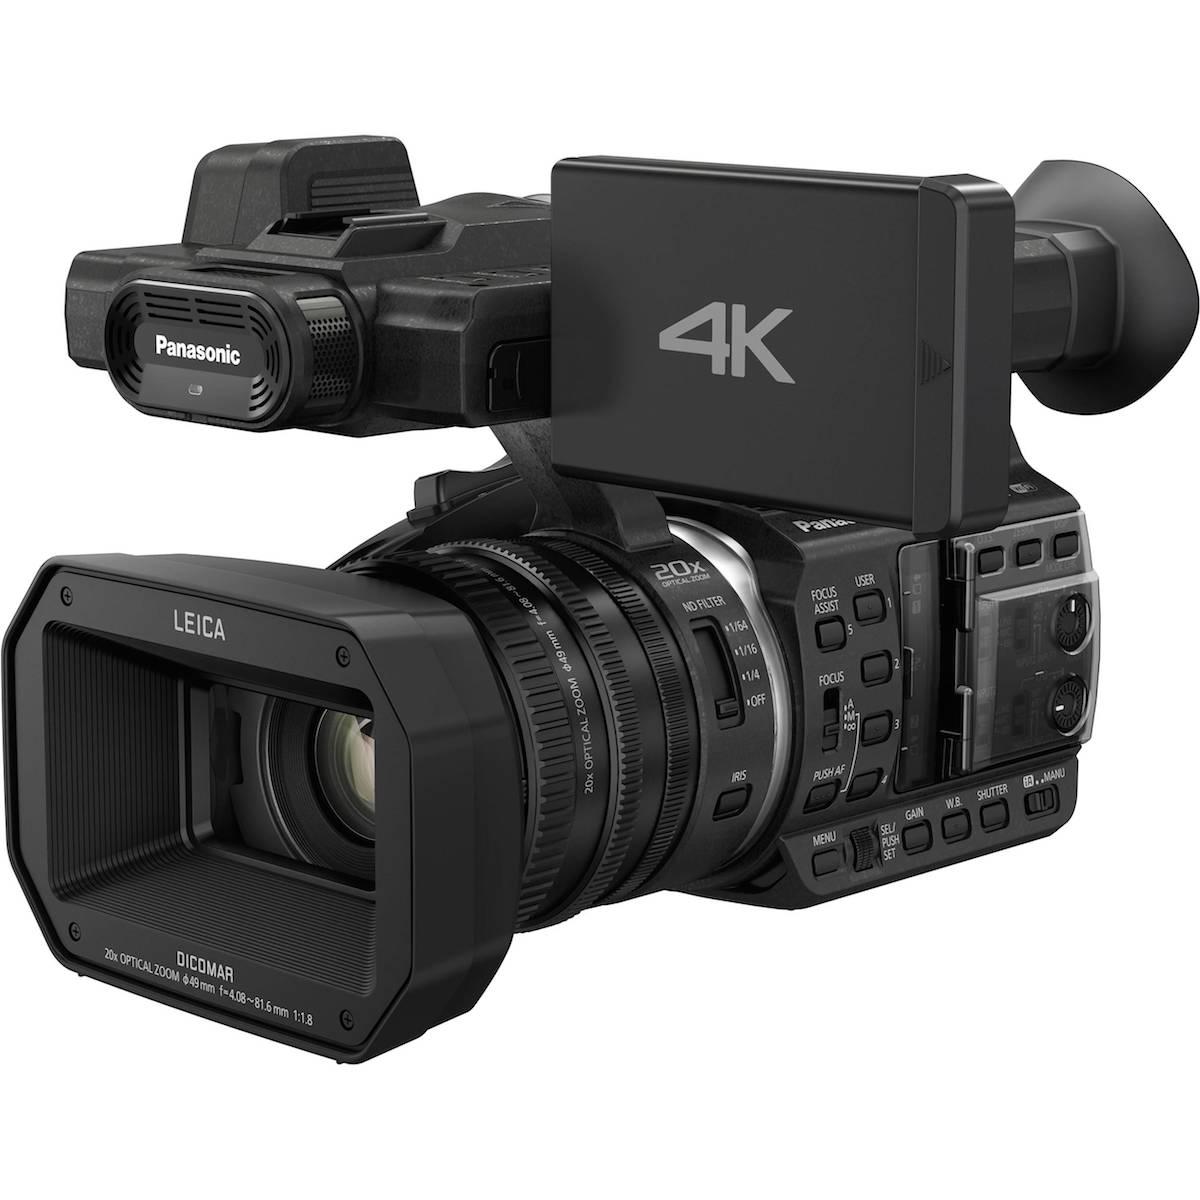 Photo of Camere video 4K: Panasonic HC-X1000 Tips & Tricks la filmare!